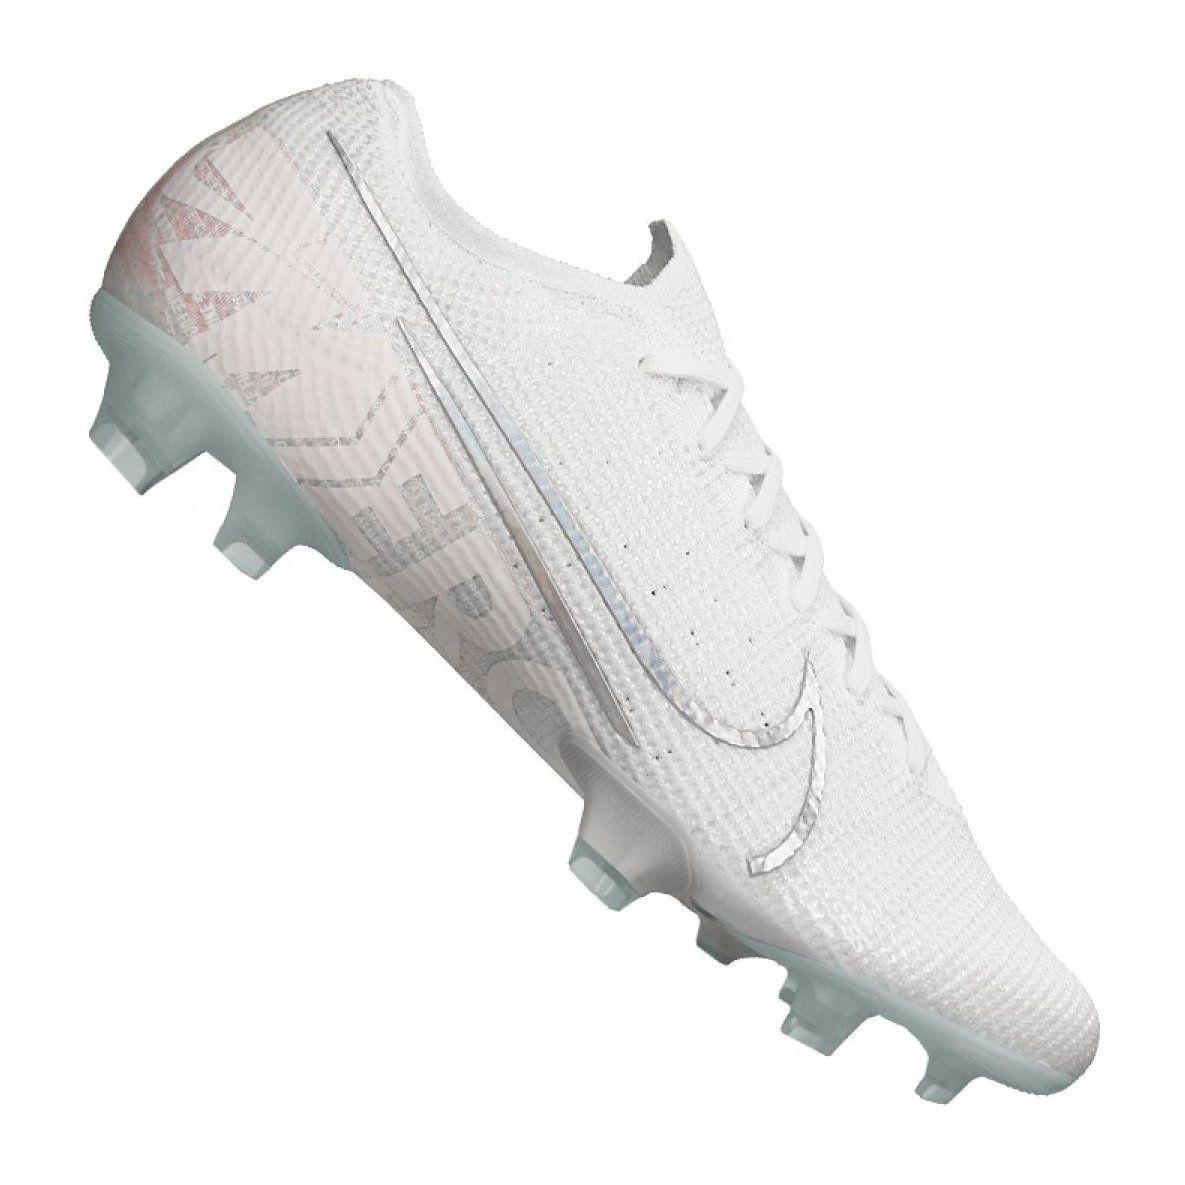 Buty Do Pilki Noznej Nike Vapor 13 Elite Fg M Aq4176 100 Biale Biale Football Shoes Nike Vapor Nike